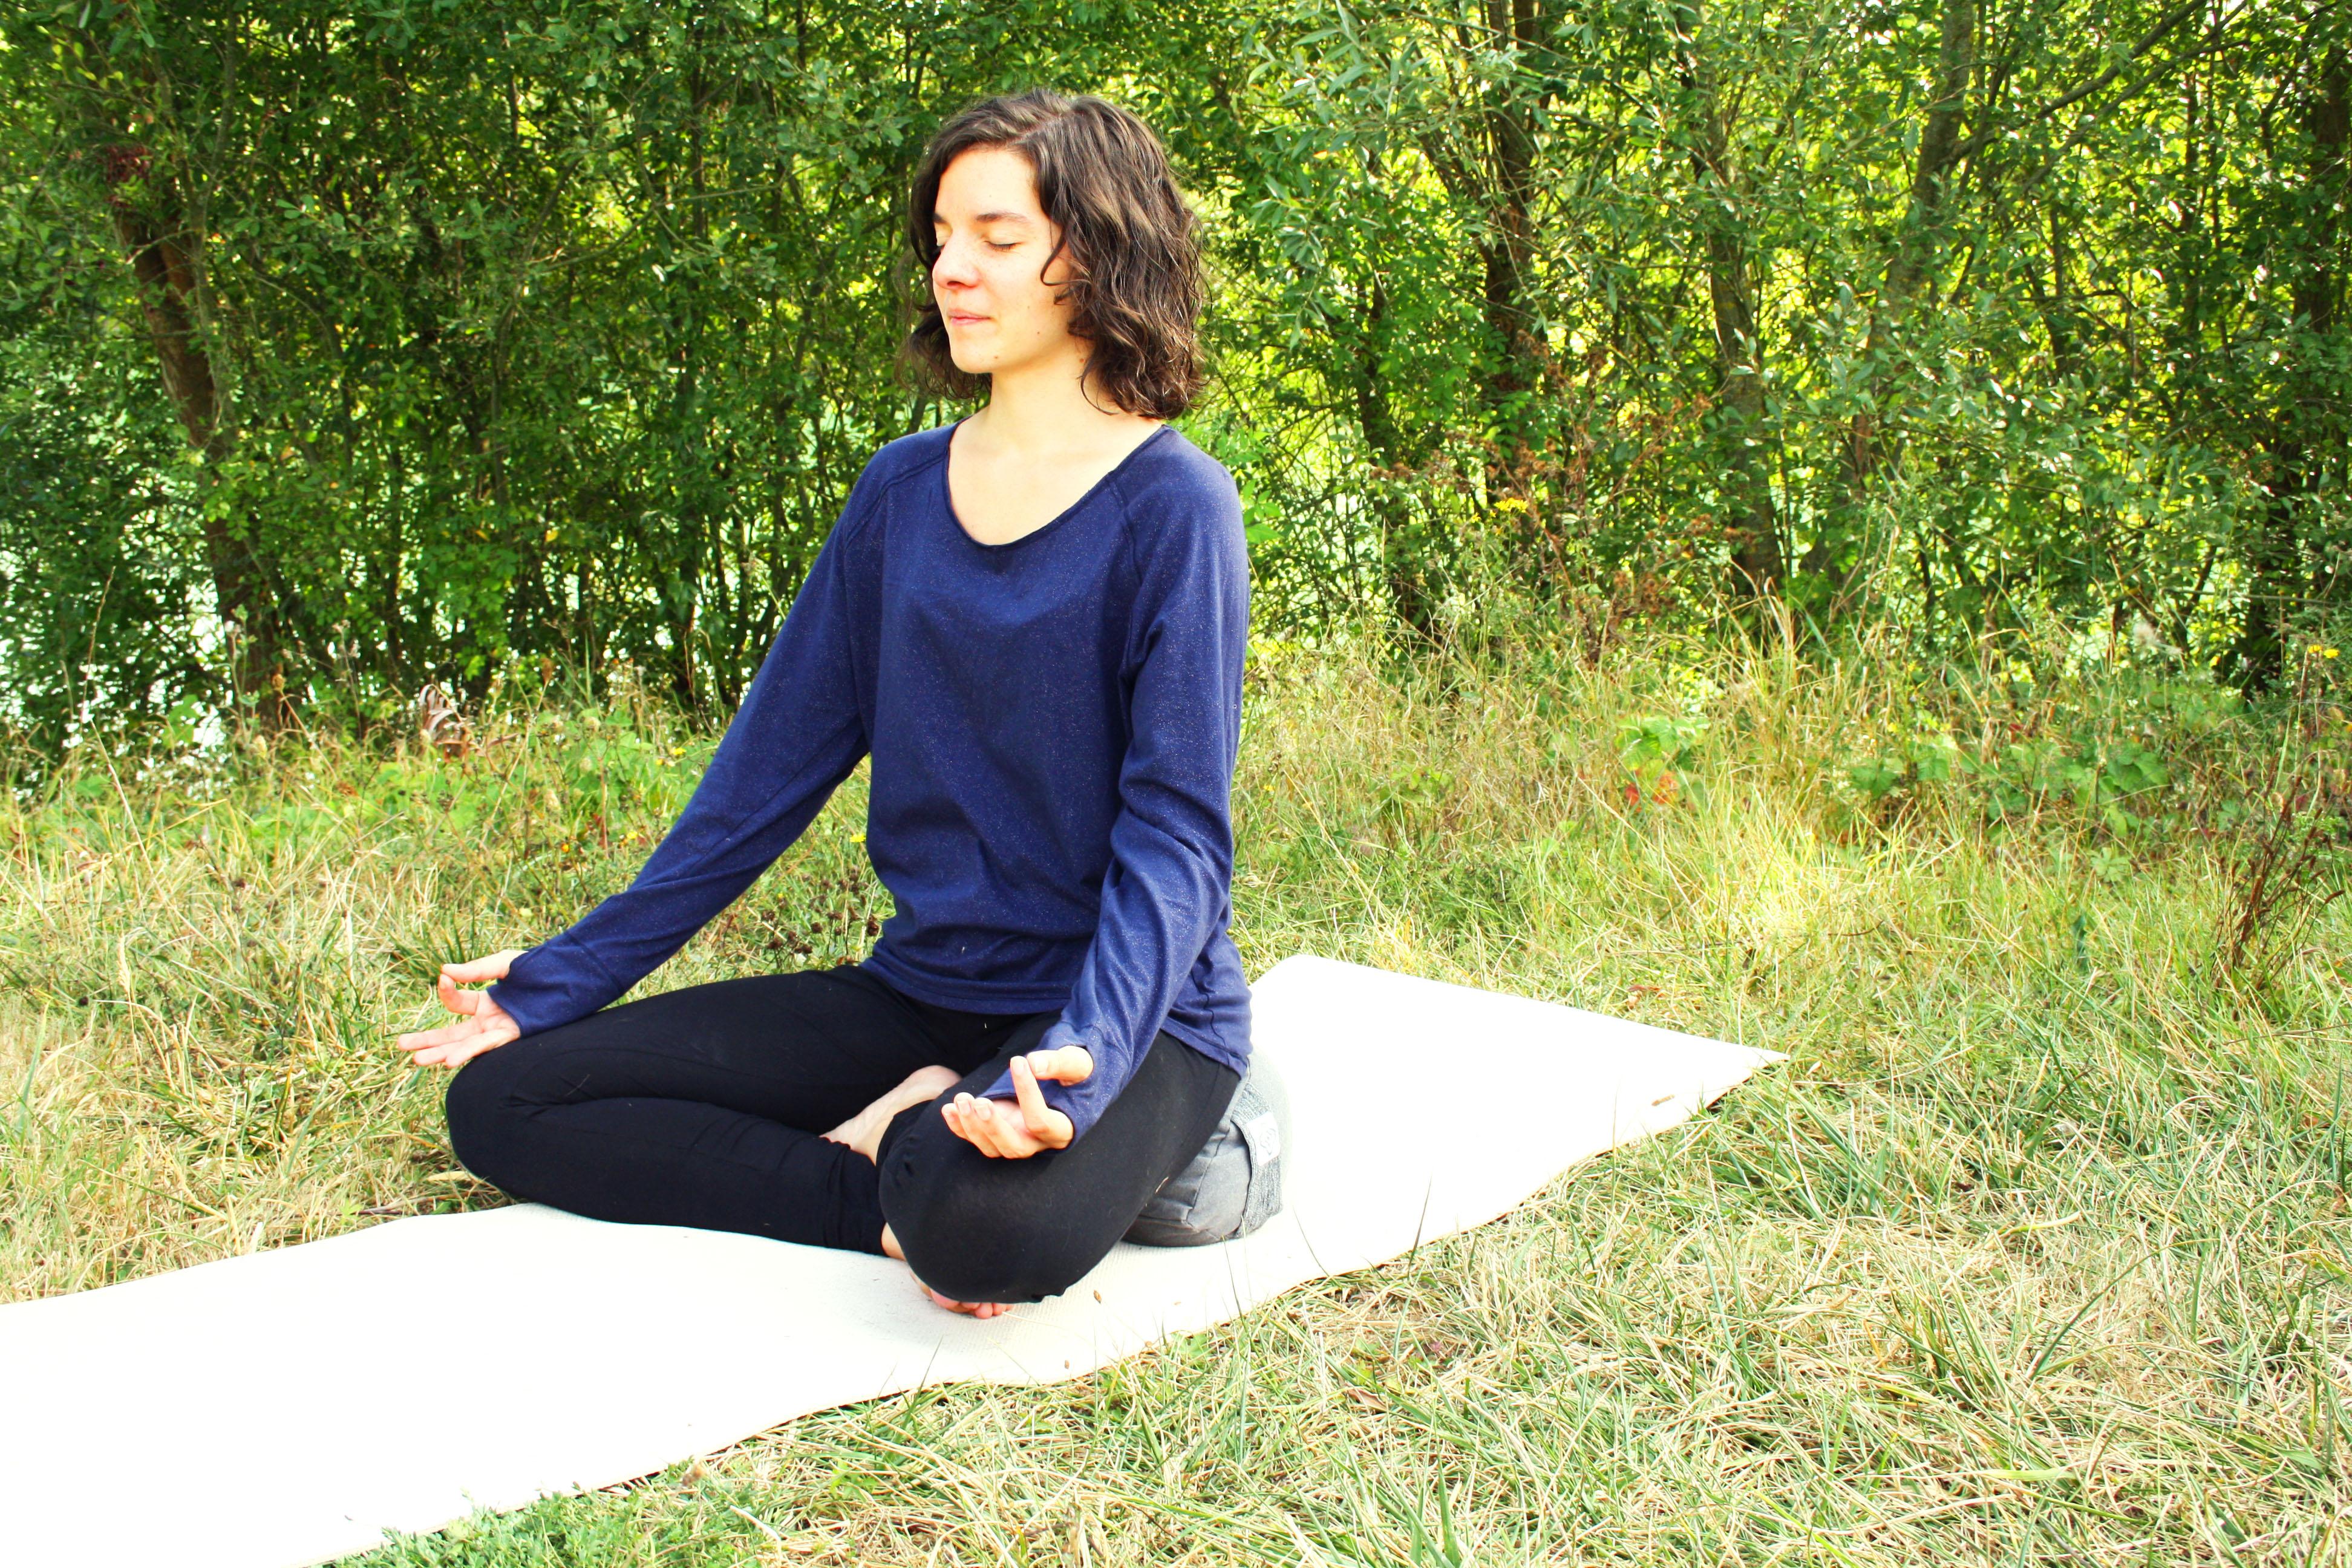 posture meditation mudras yoga